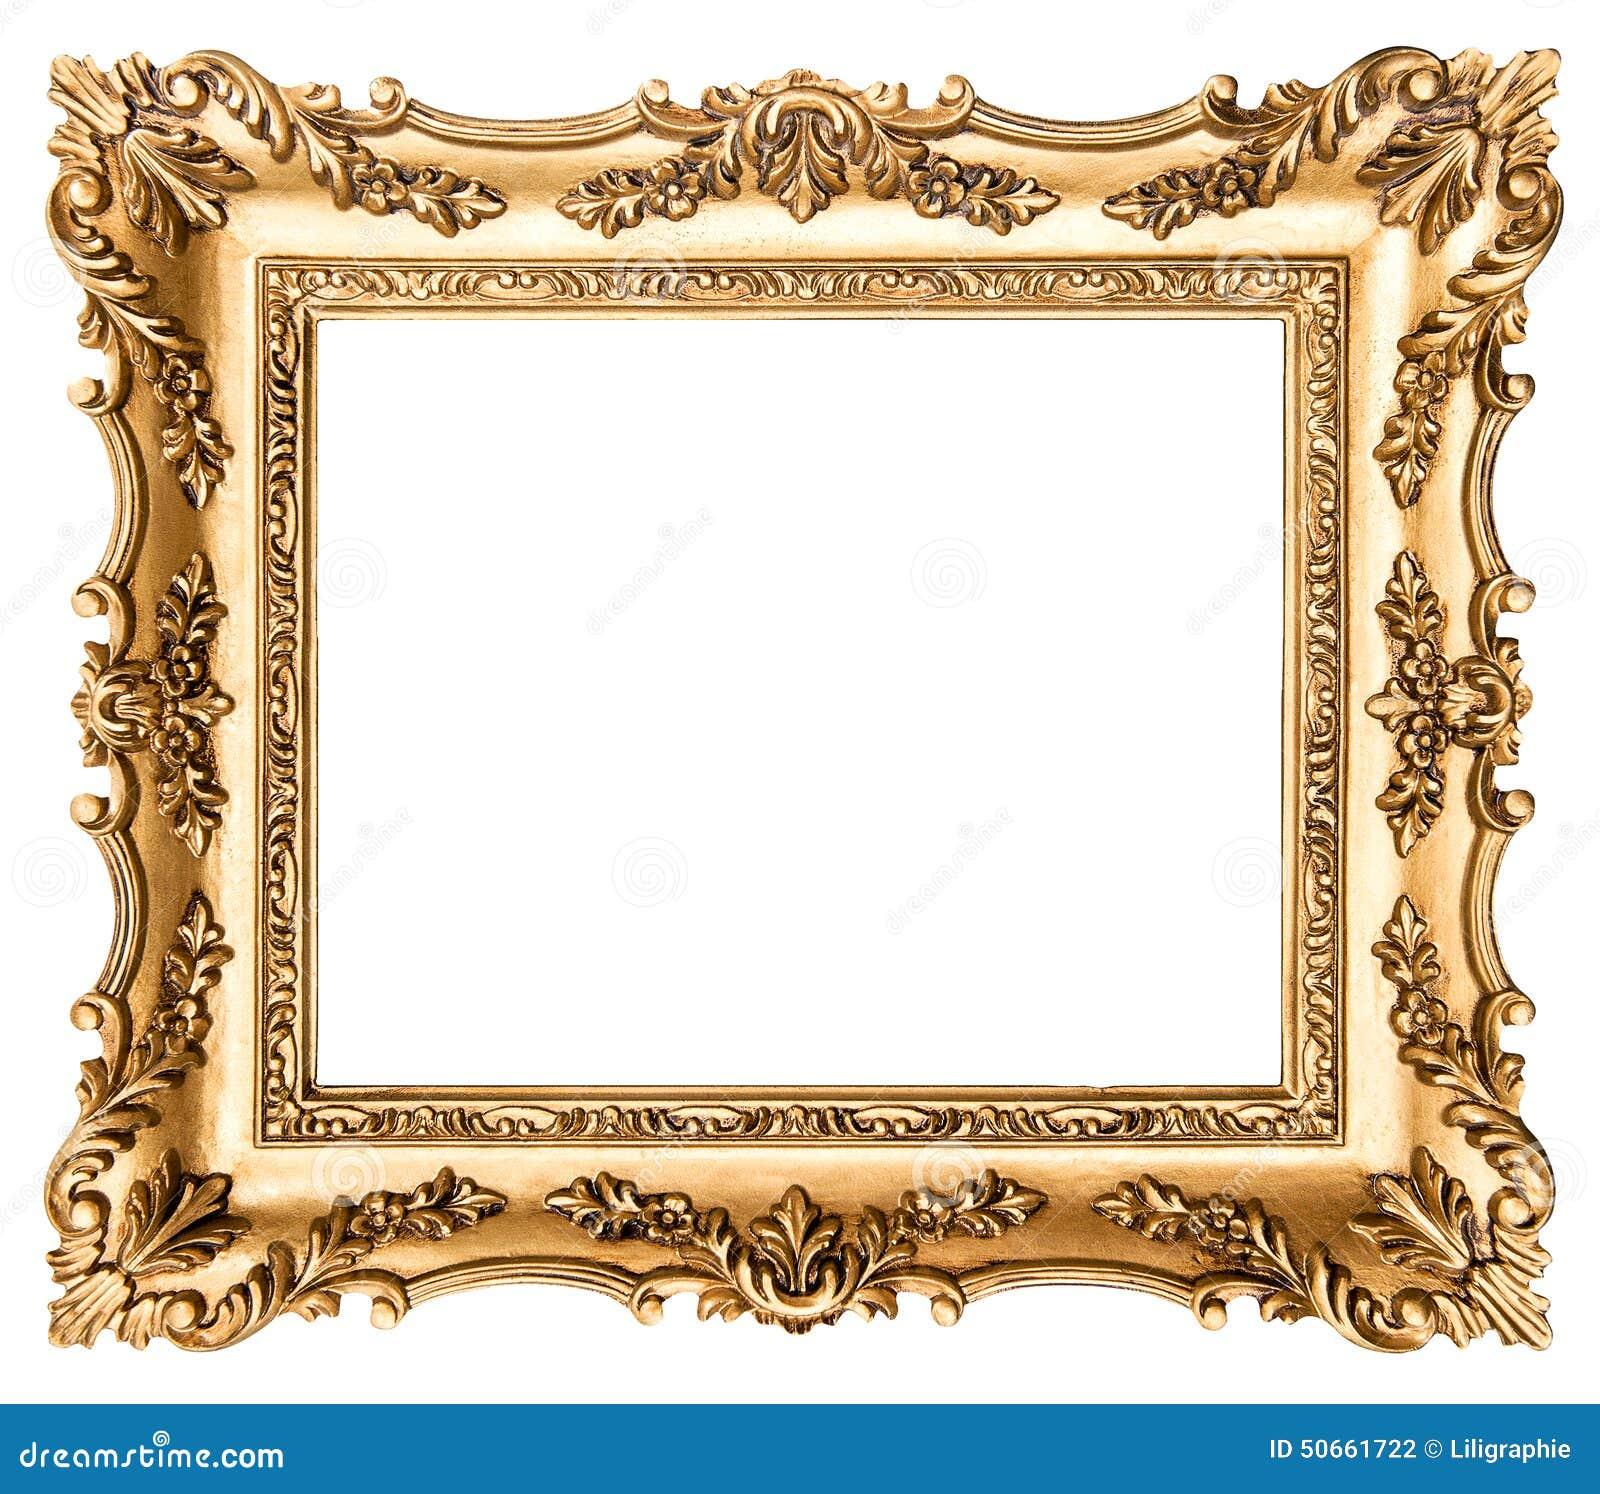 Vintage golden picture frame antique style object stock for Small vintage style picture frames